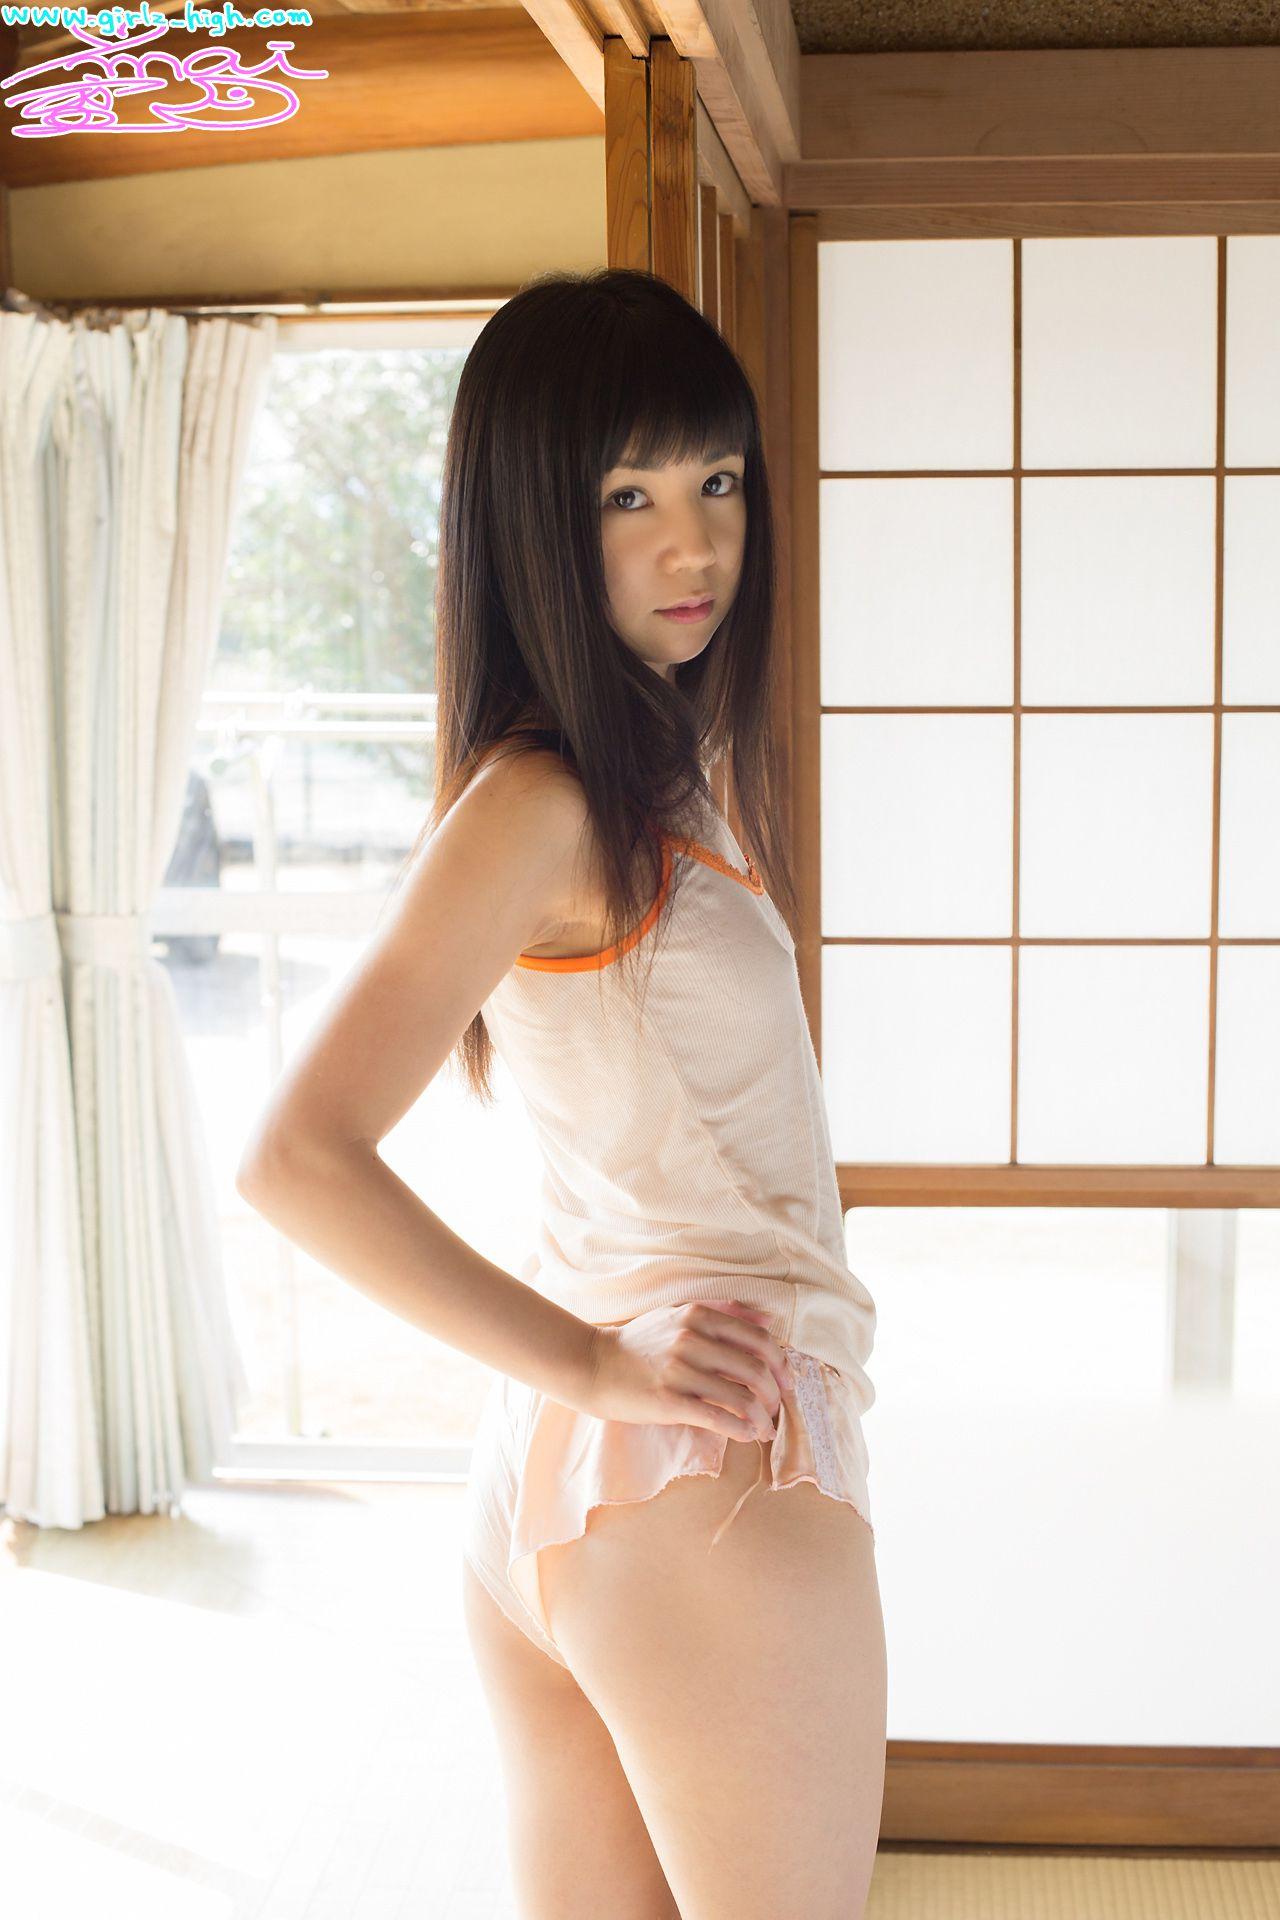 [Girlz-High]今井蜜月超高清写真大图片(39P)|587热度